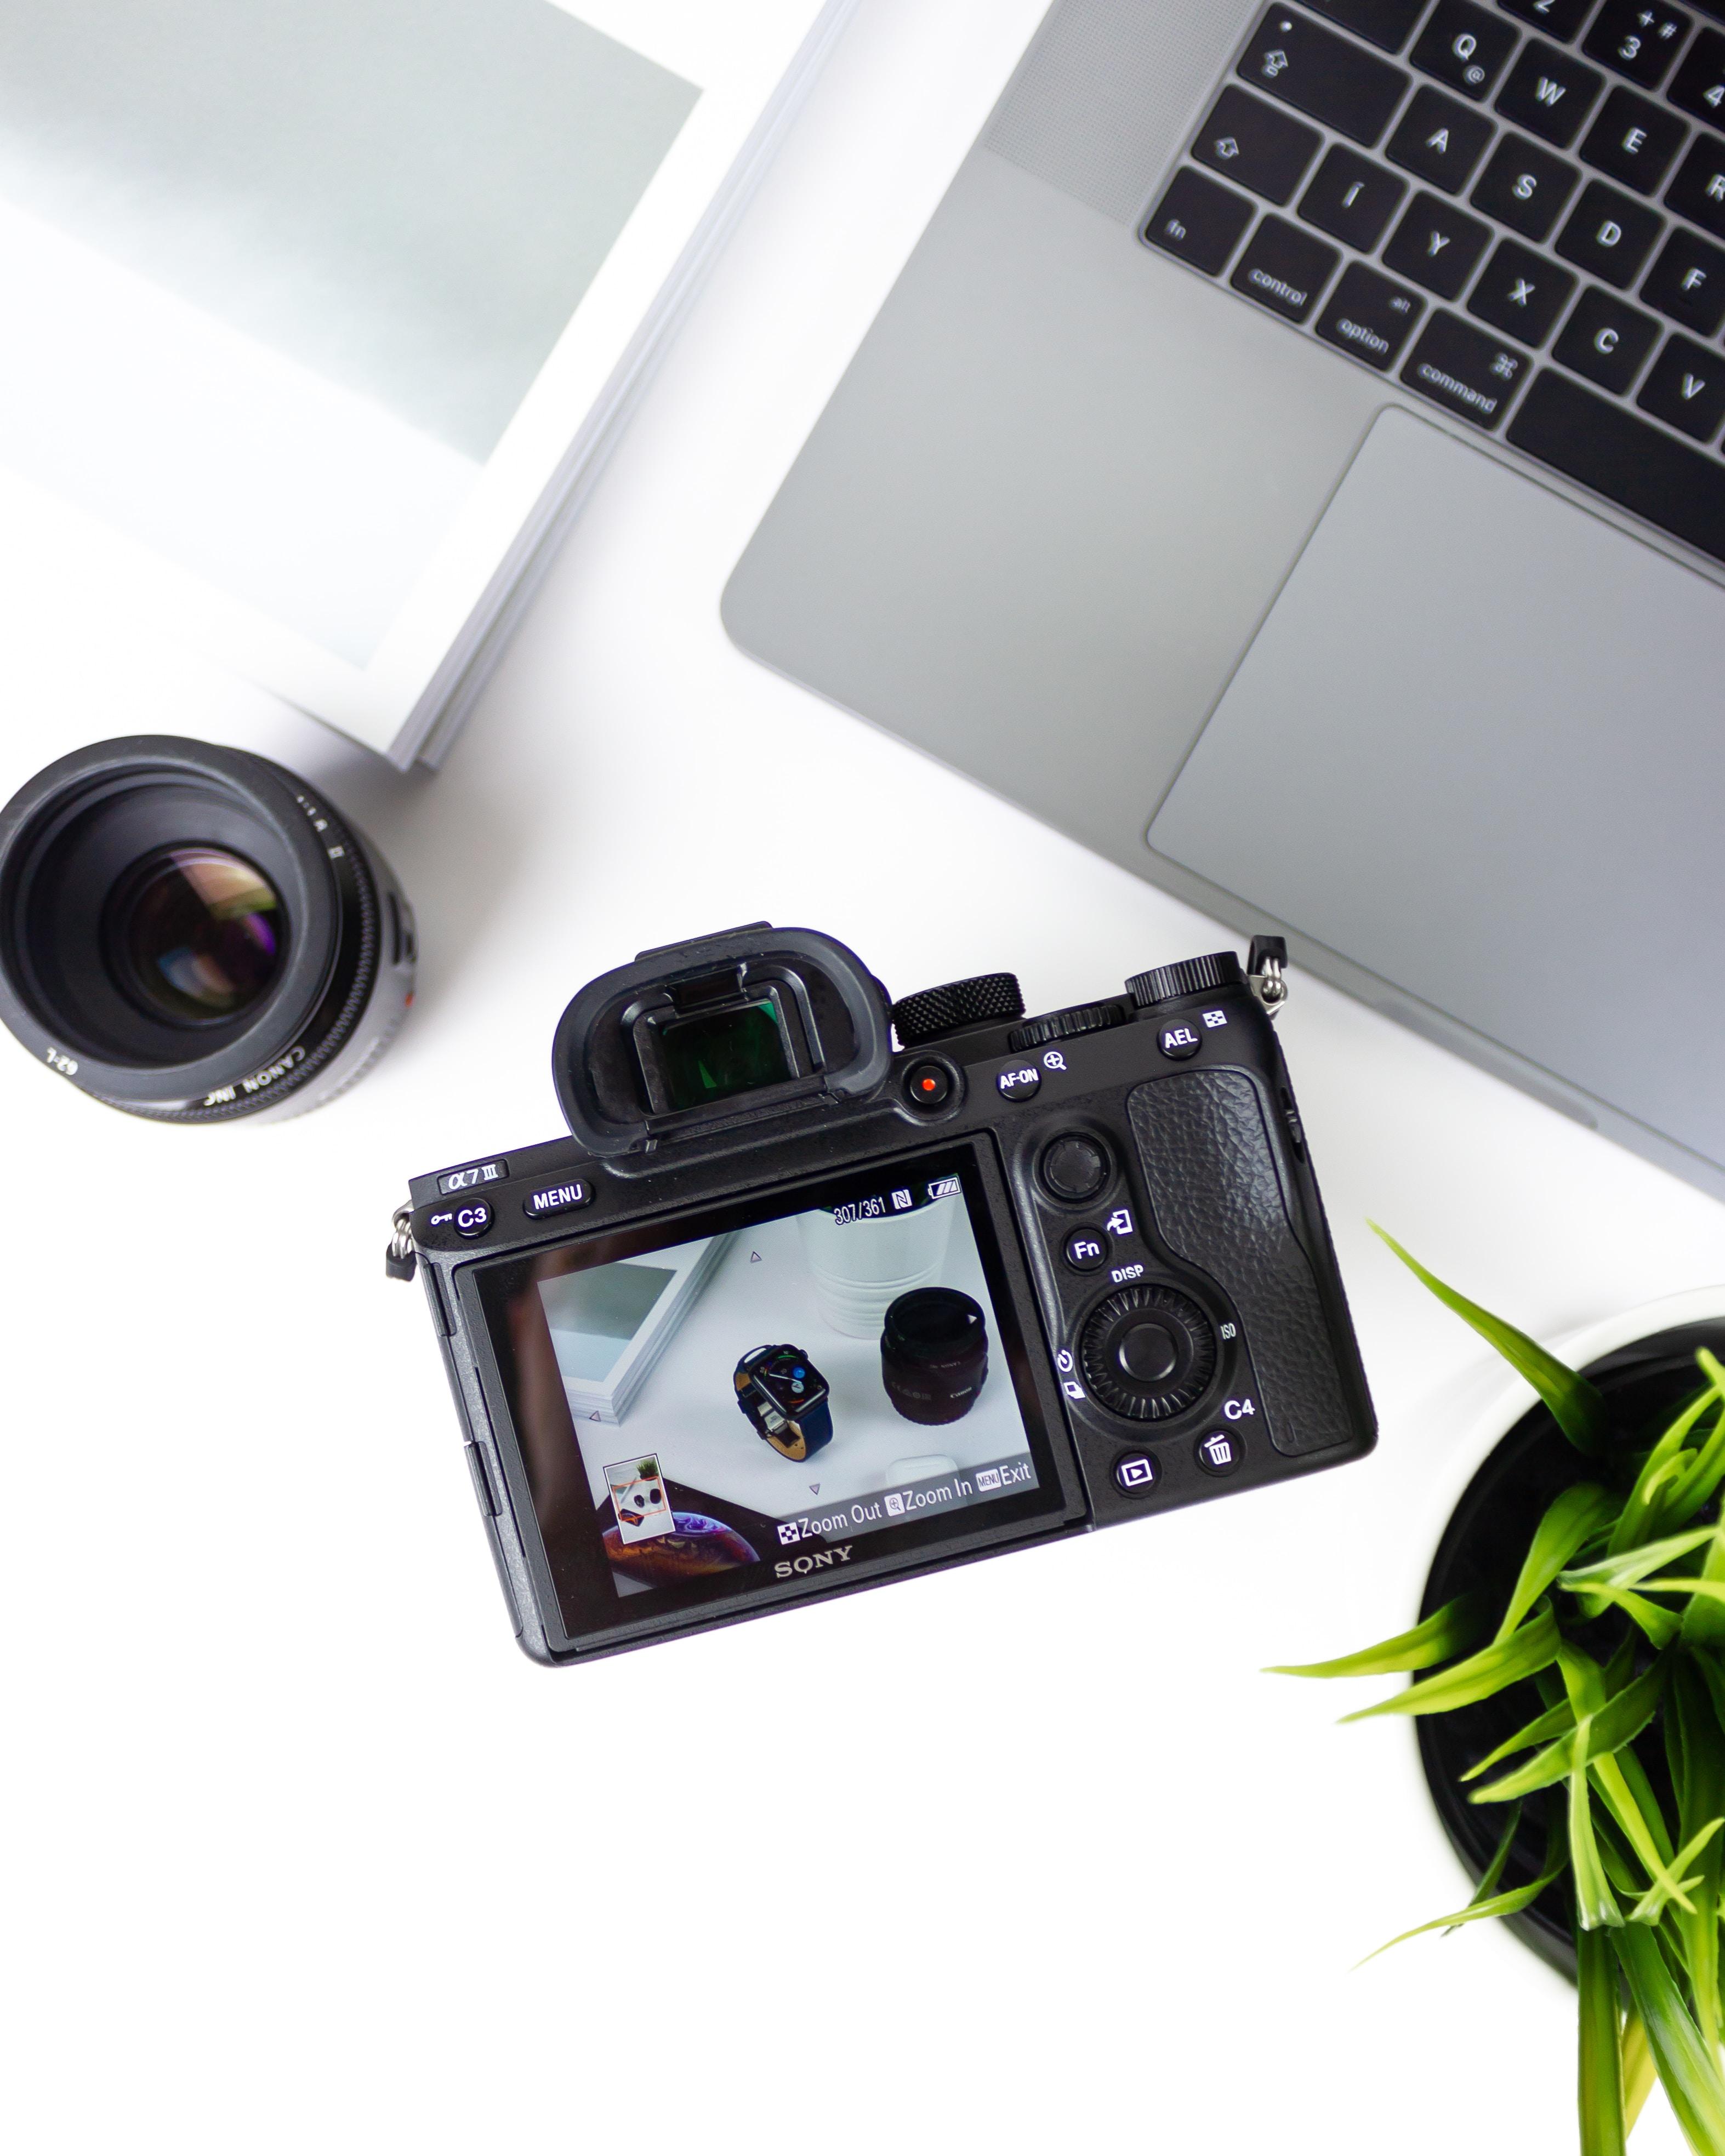 black bridge camera near laptop computer